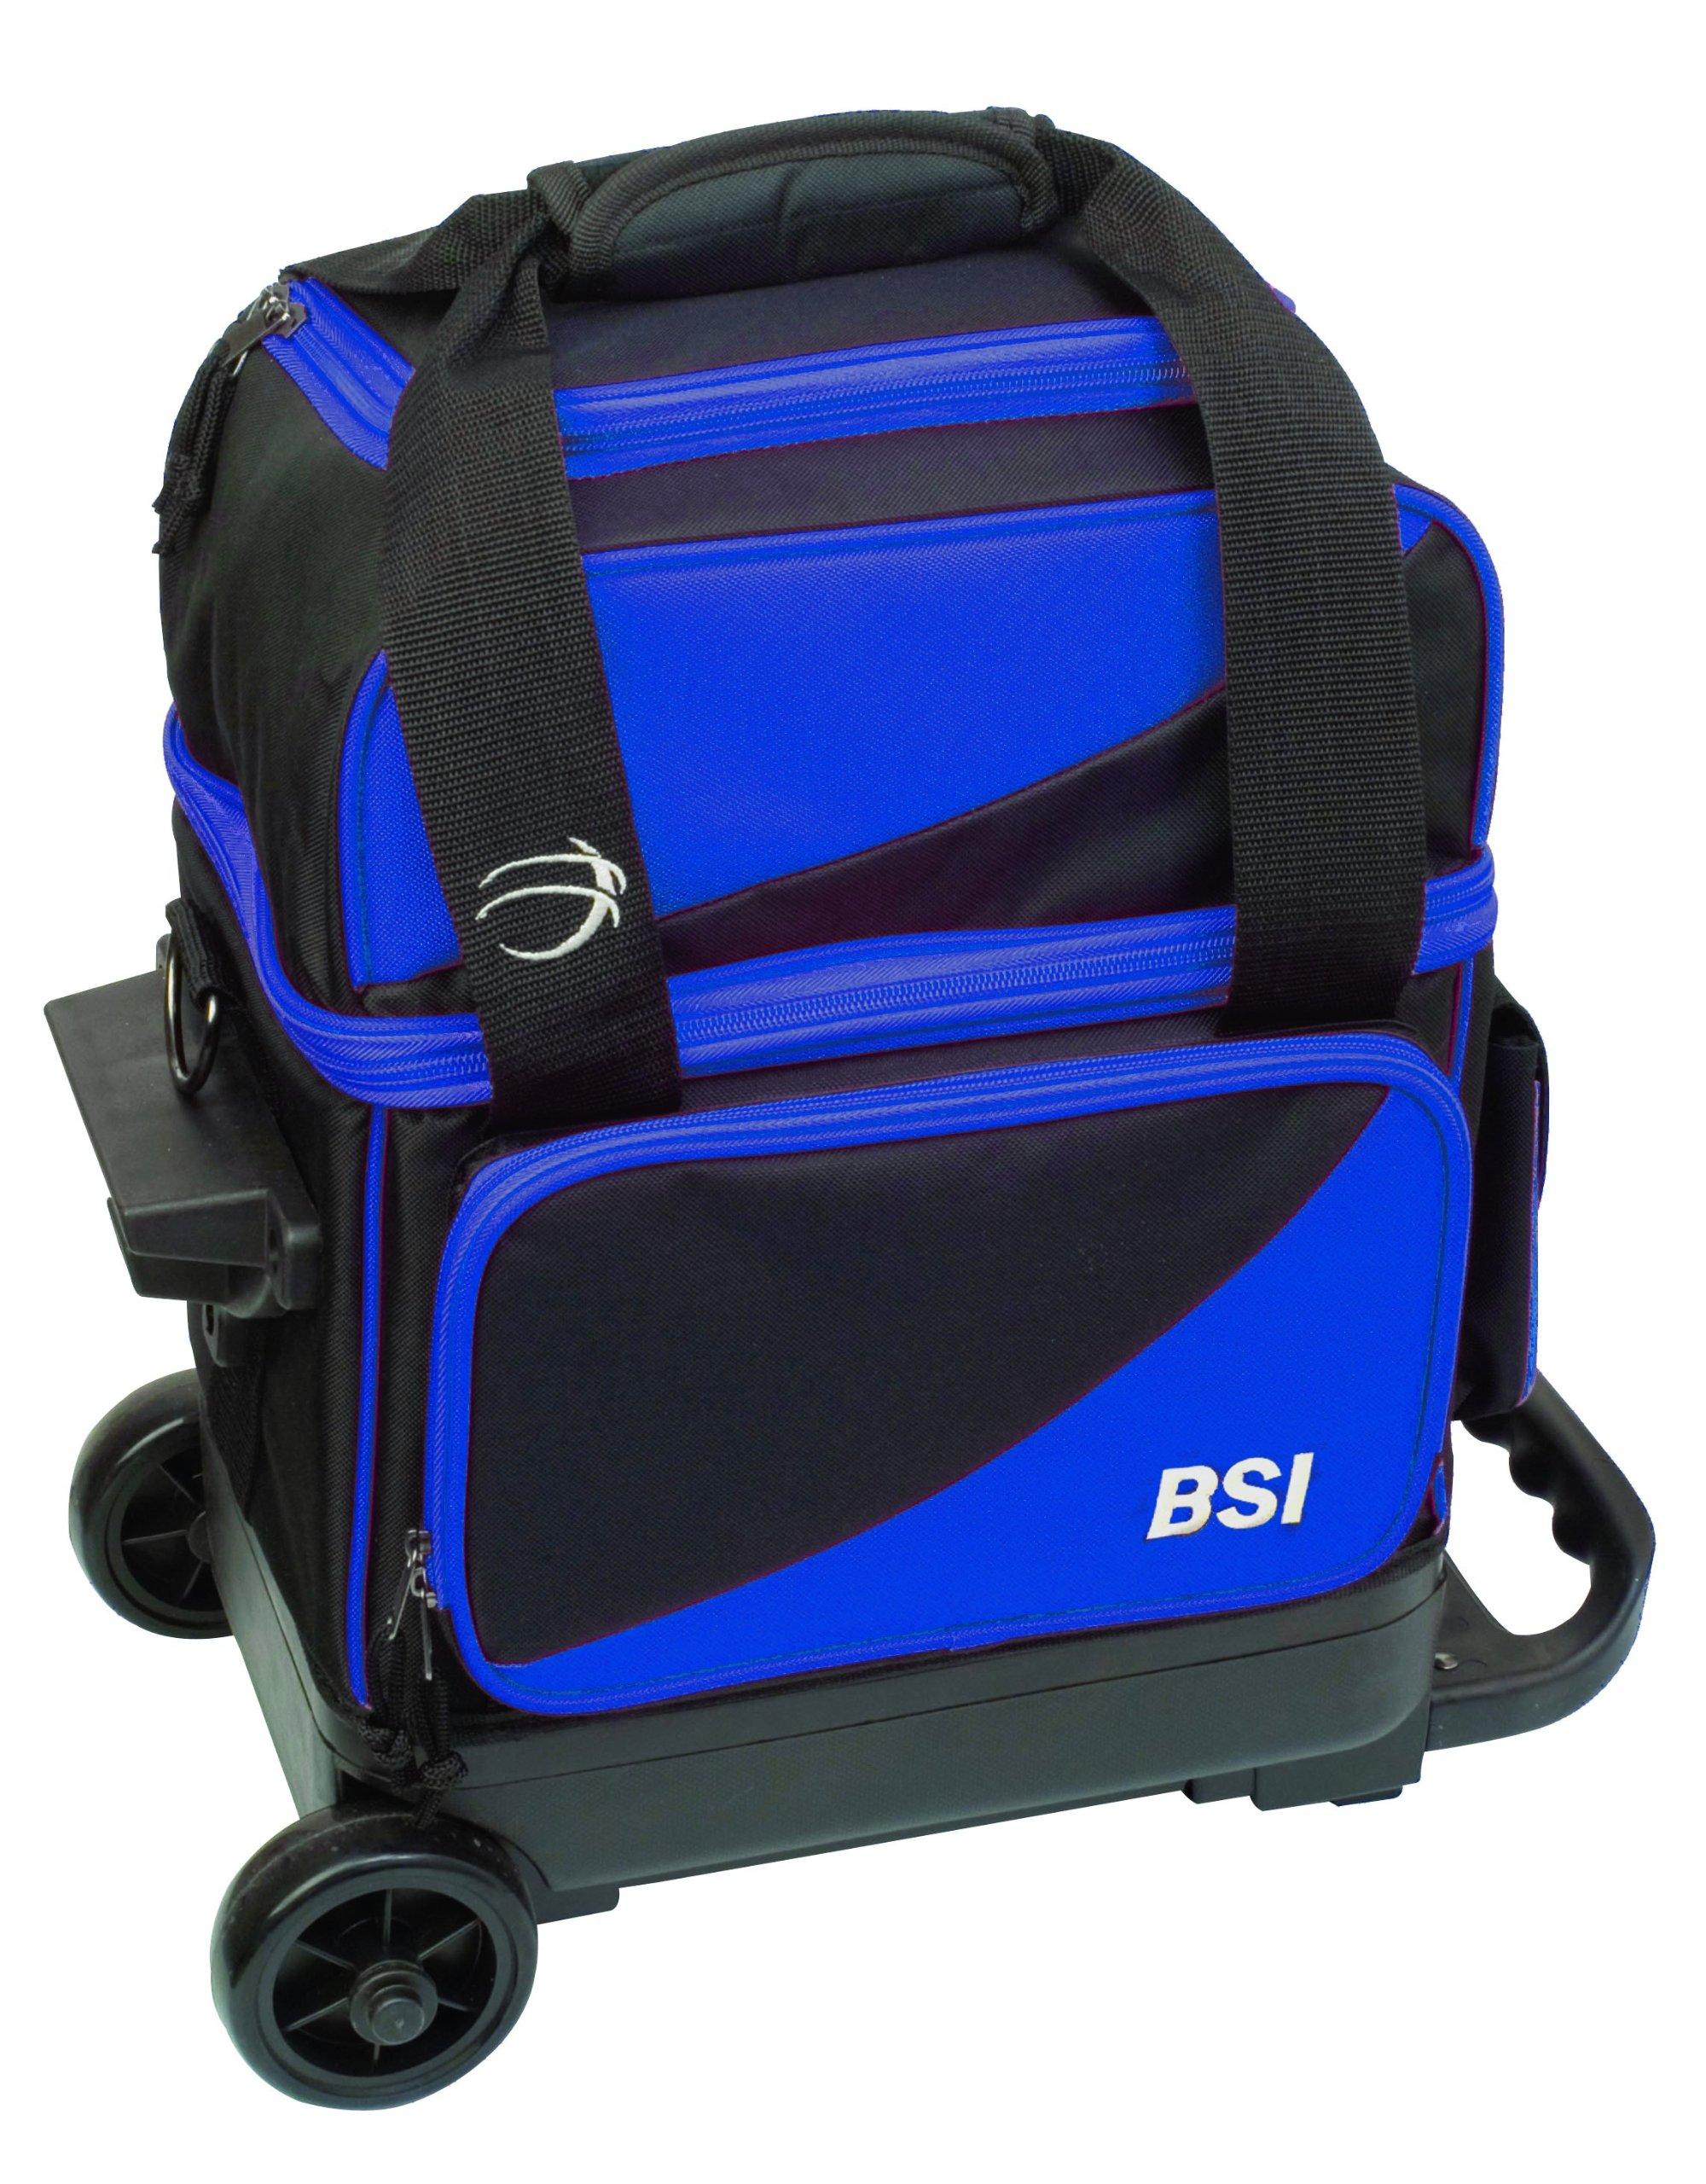 BSI Single Ball Roller Bowling Bag, Black/Blue